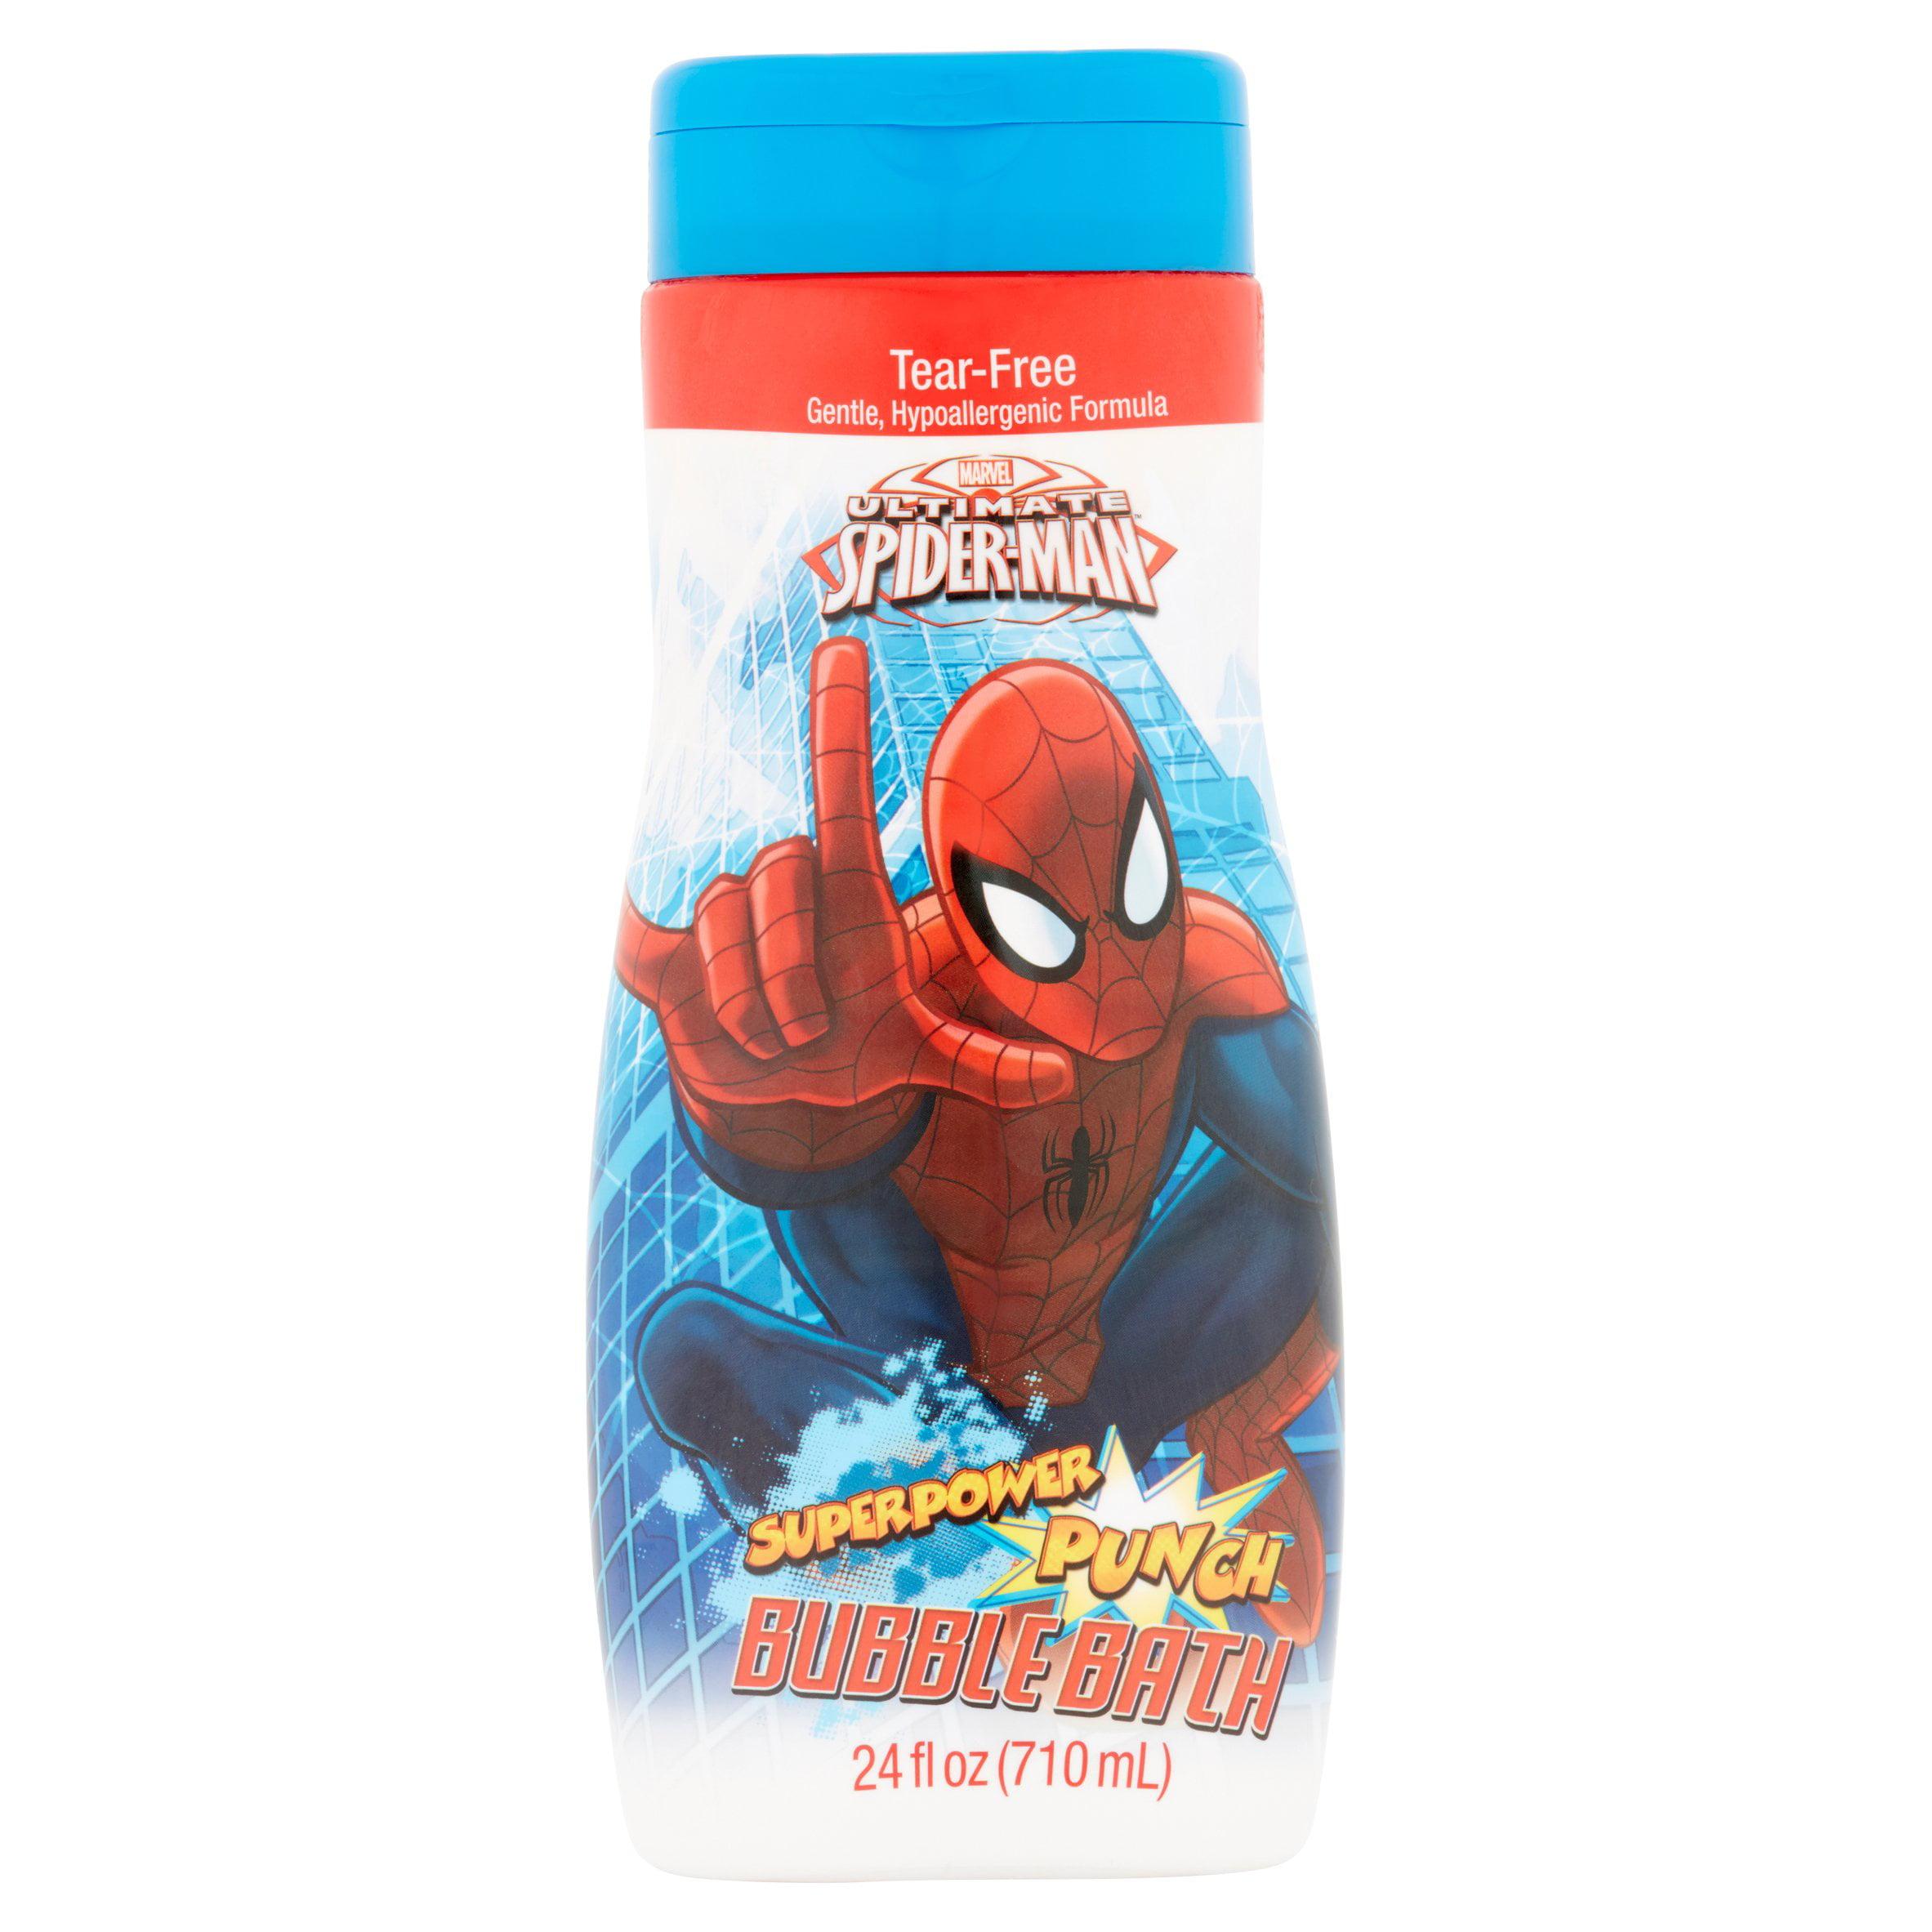 Marvel Ultimate Spider-Man Superpower Punch Bubble Bath, 24 fl oz